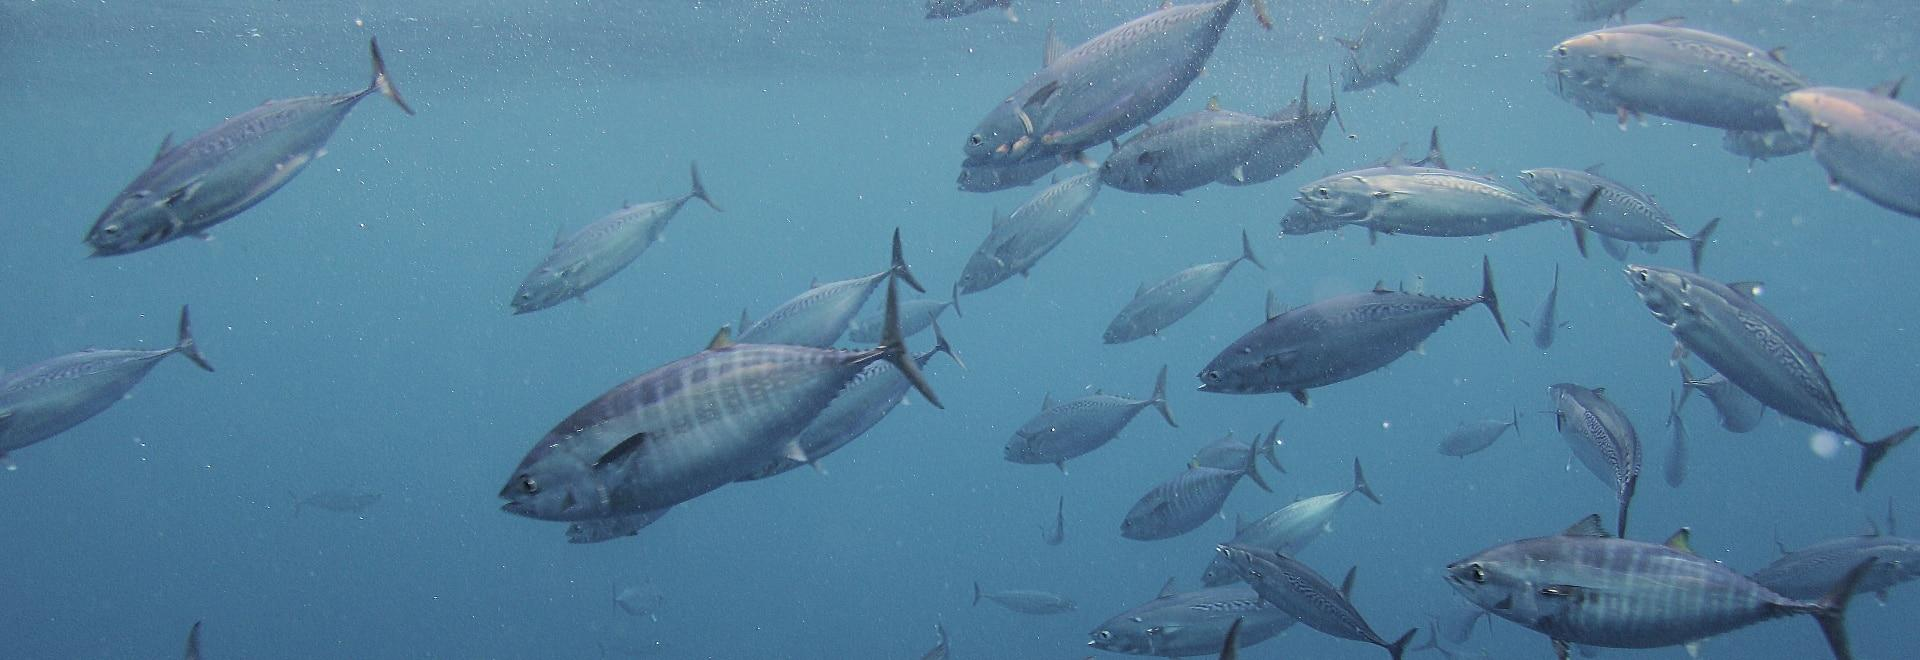 Marlin blu - La tecnica